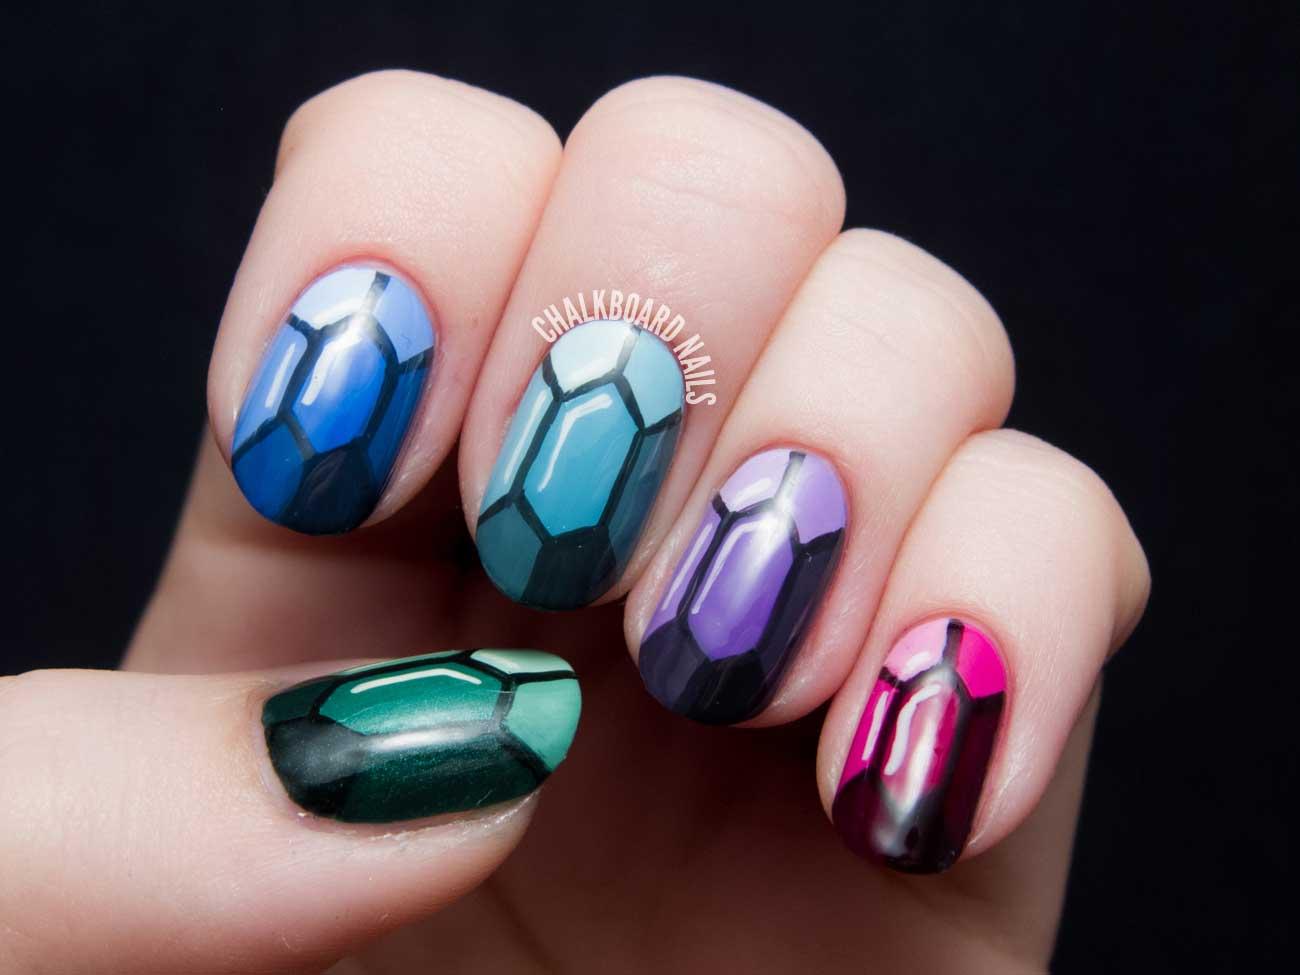 Precious Gems Nail Art by Chalkboard Nails